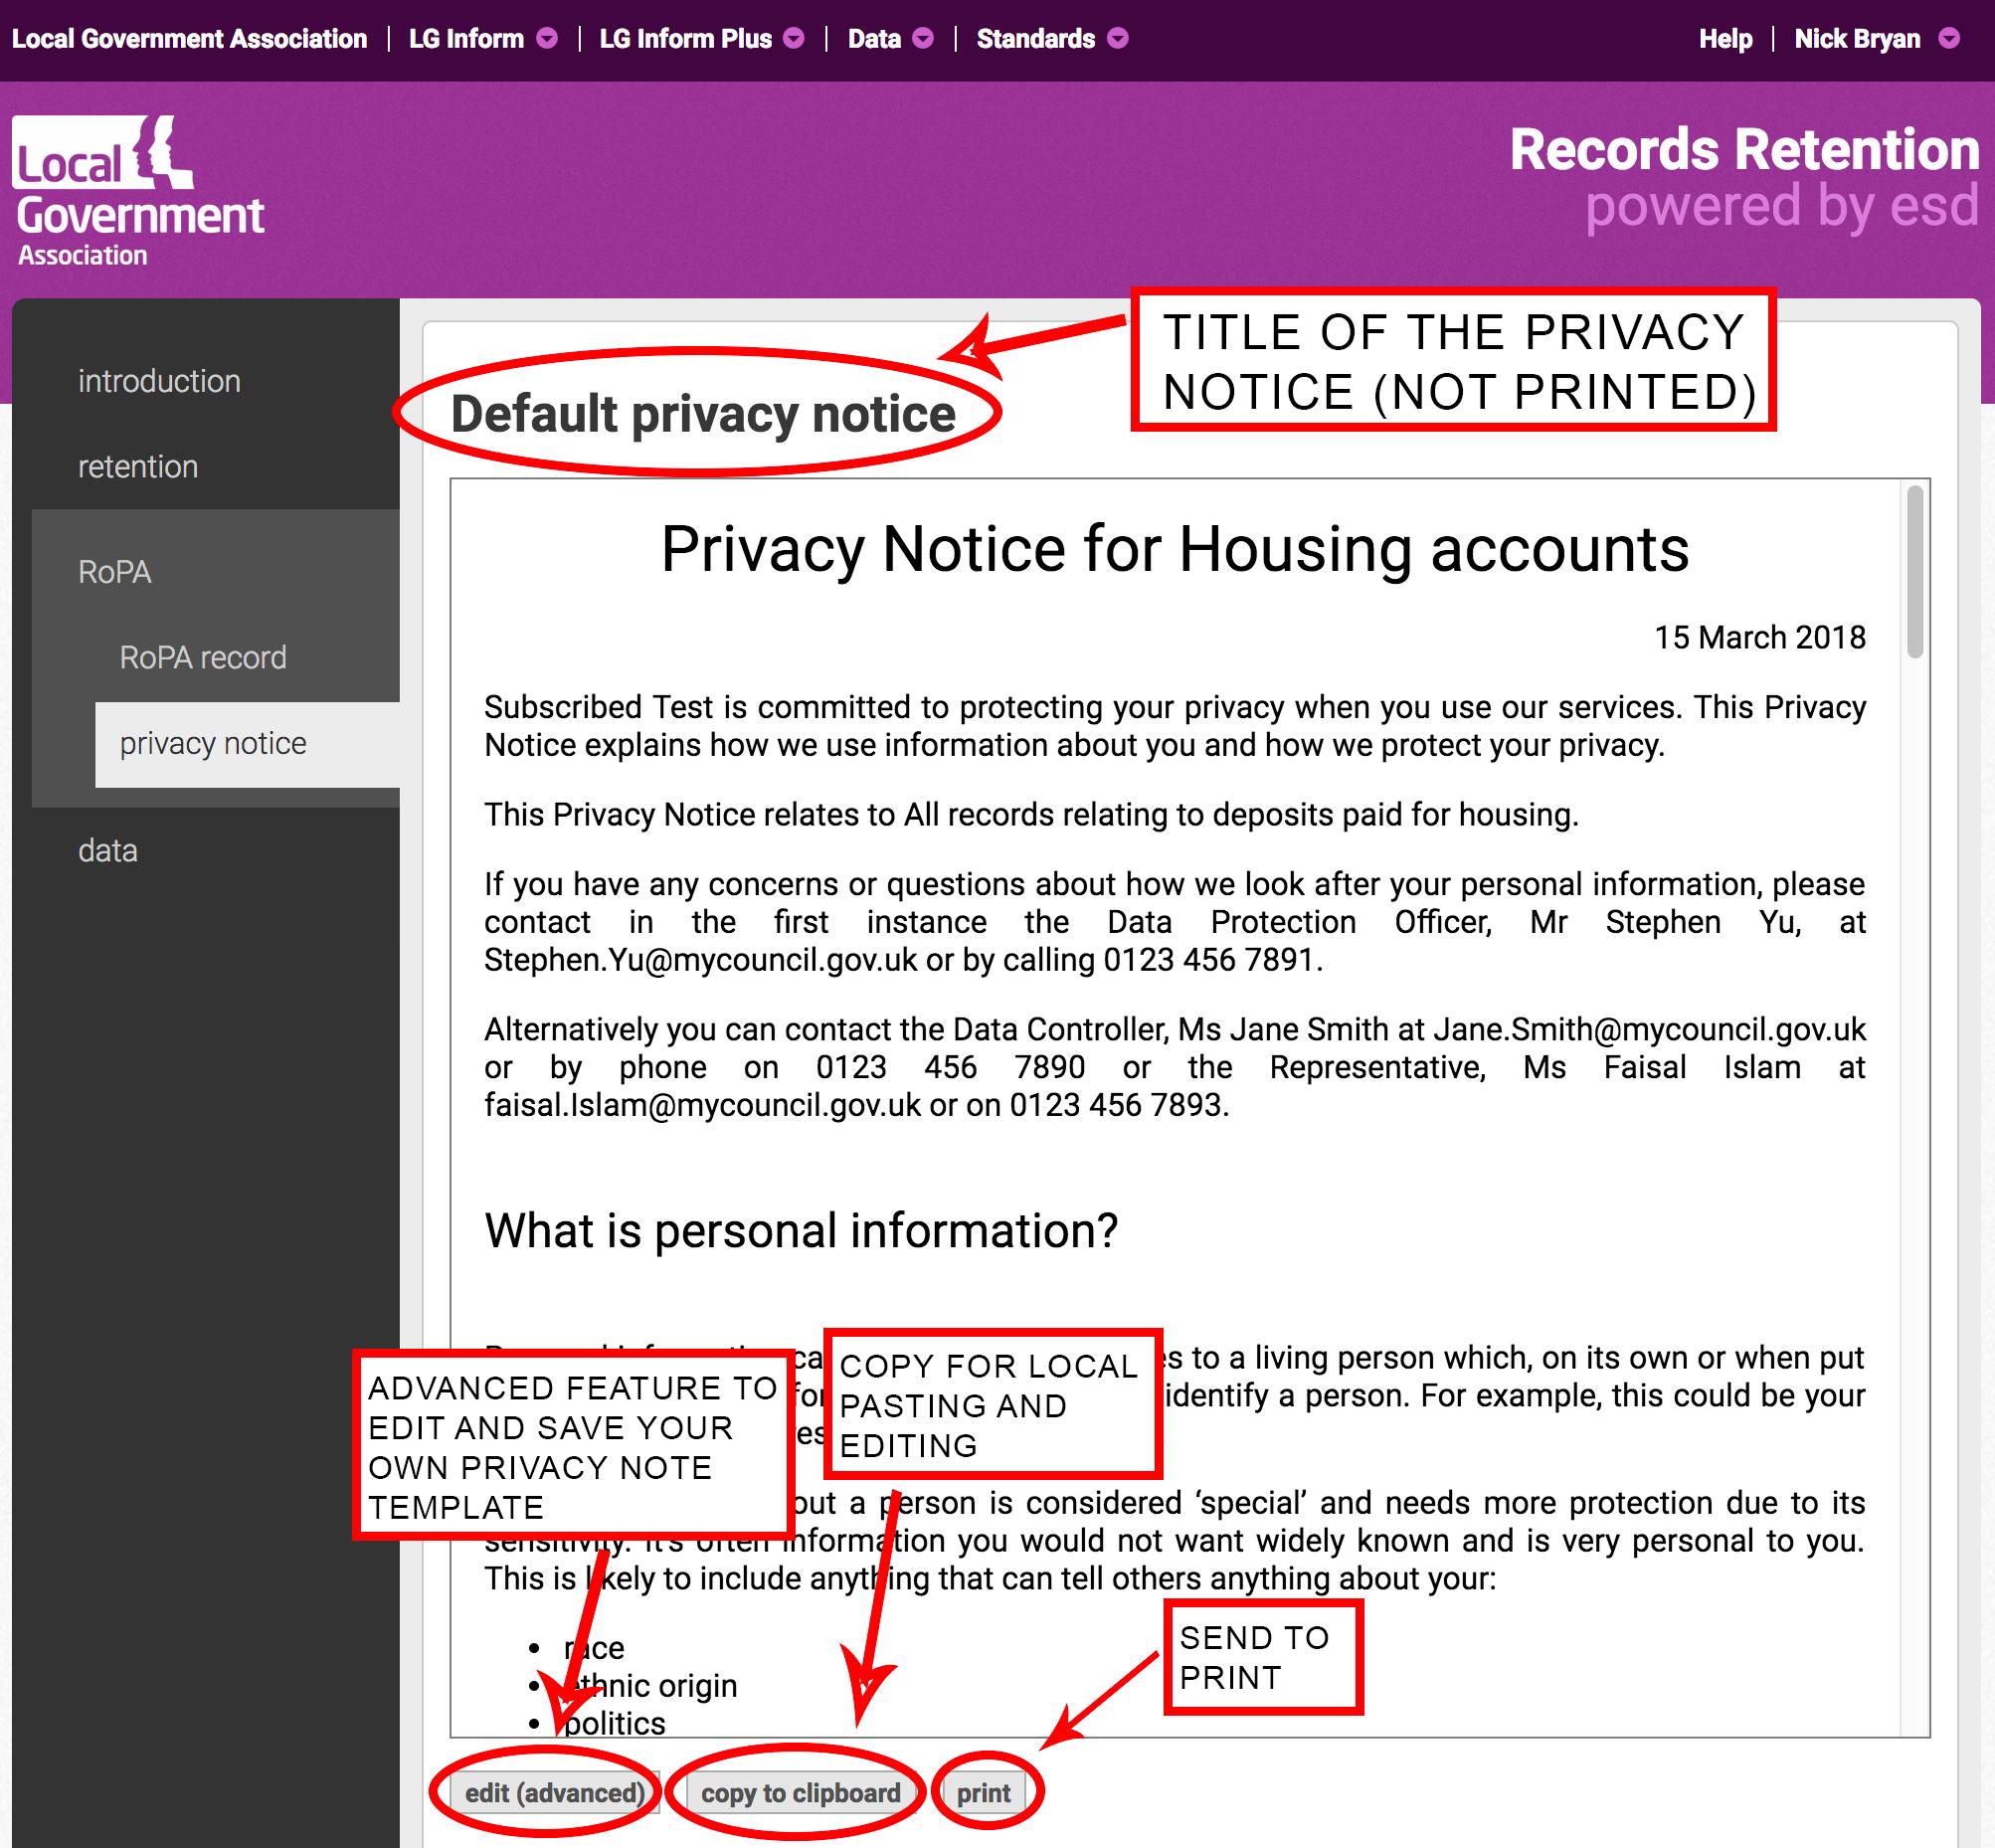 Adding a privacy notice